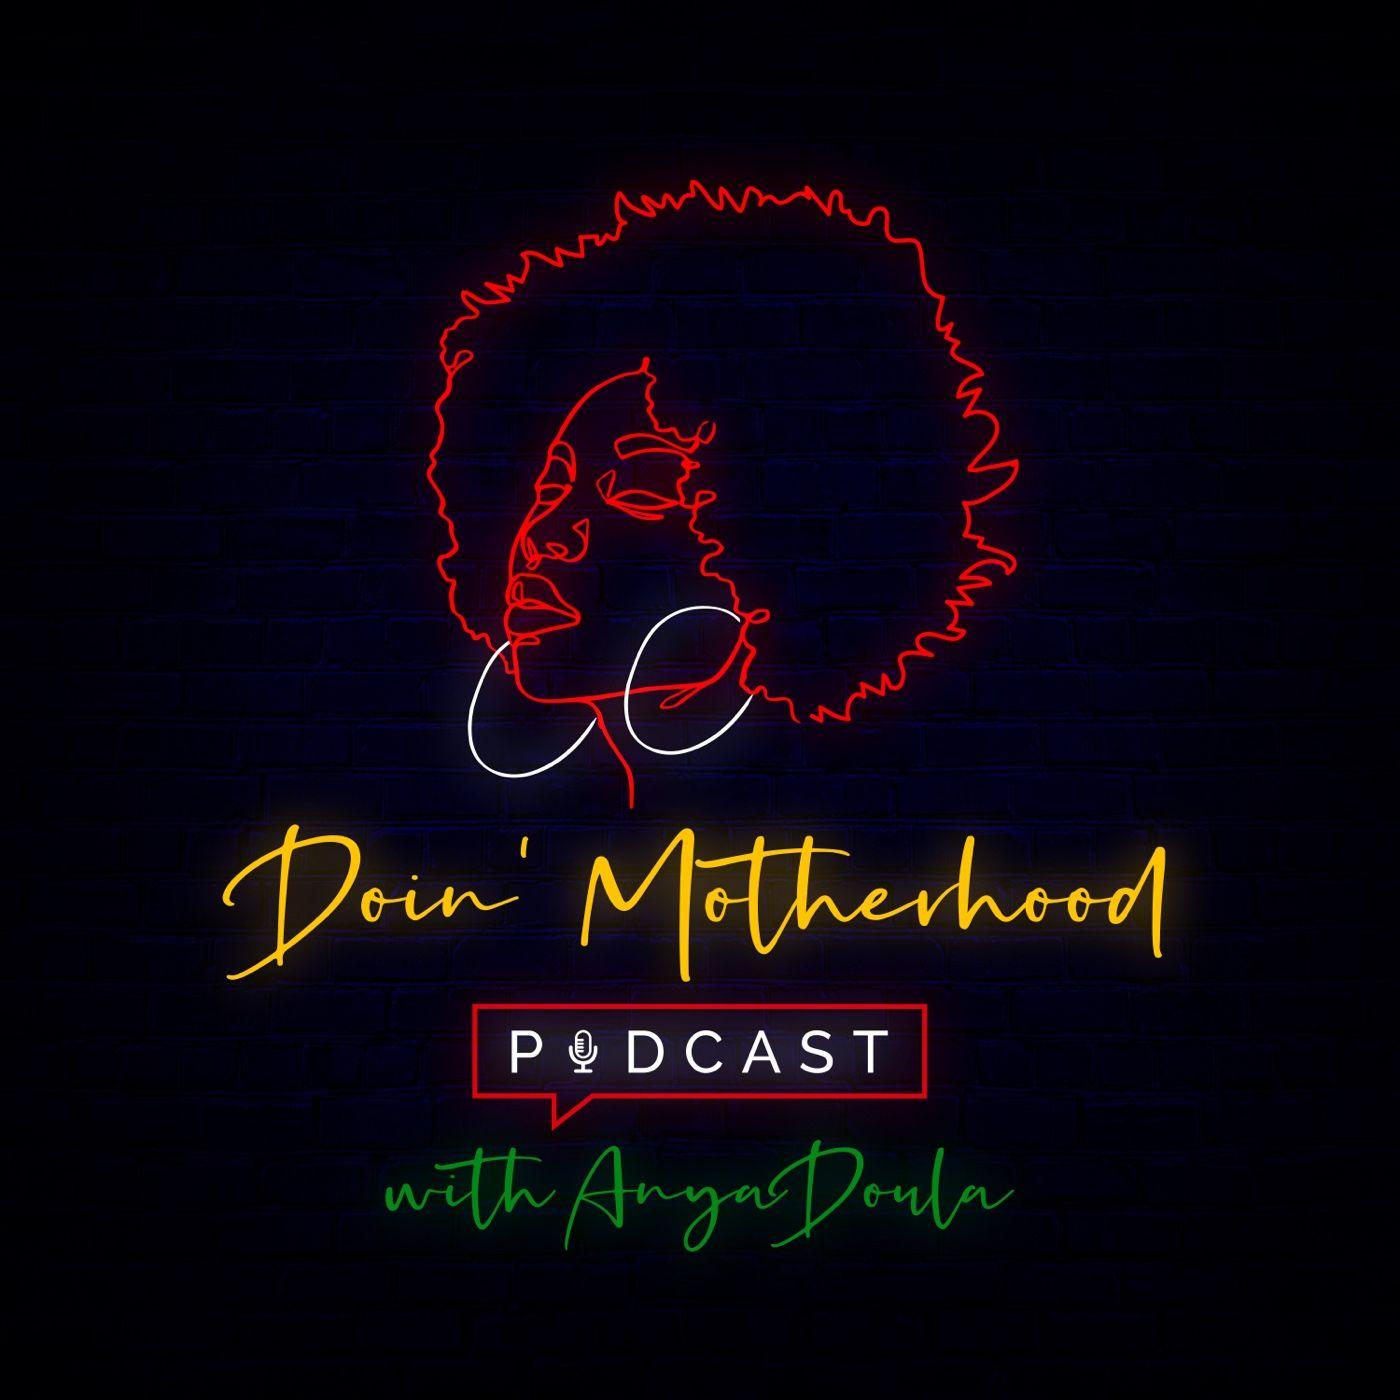 Doin Motherhood Podcast w/ AnyaDoula